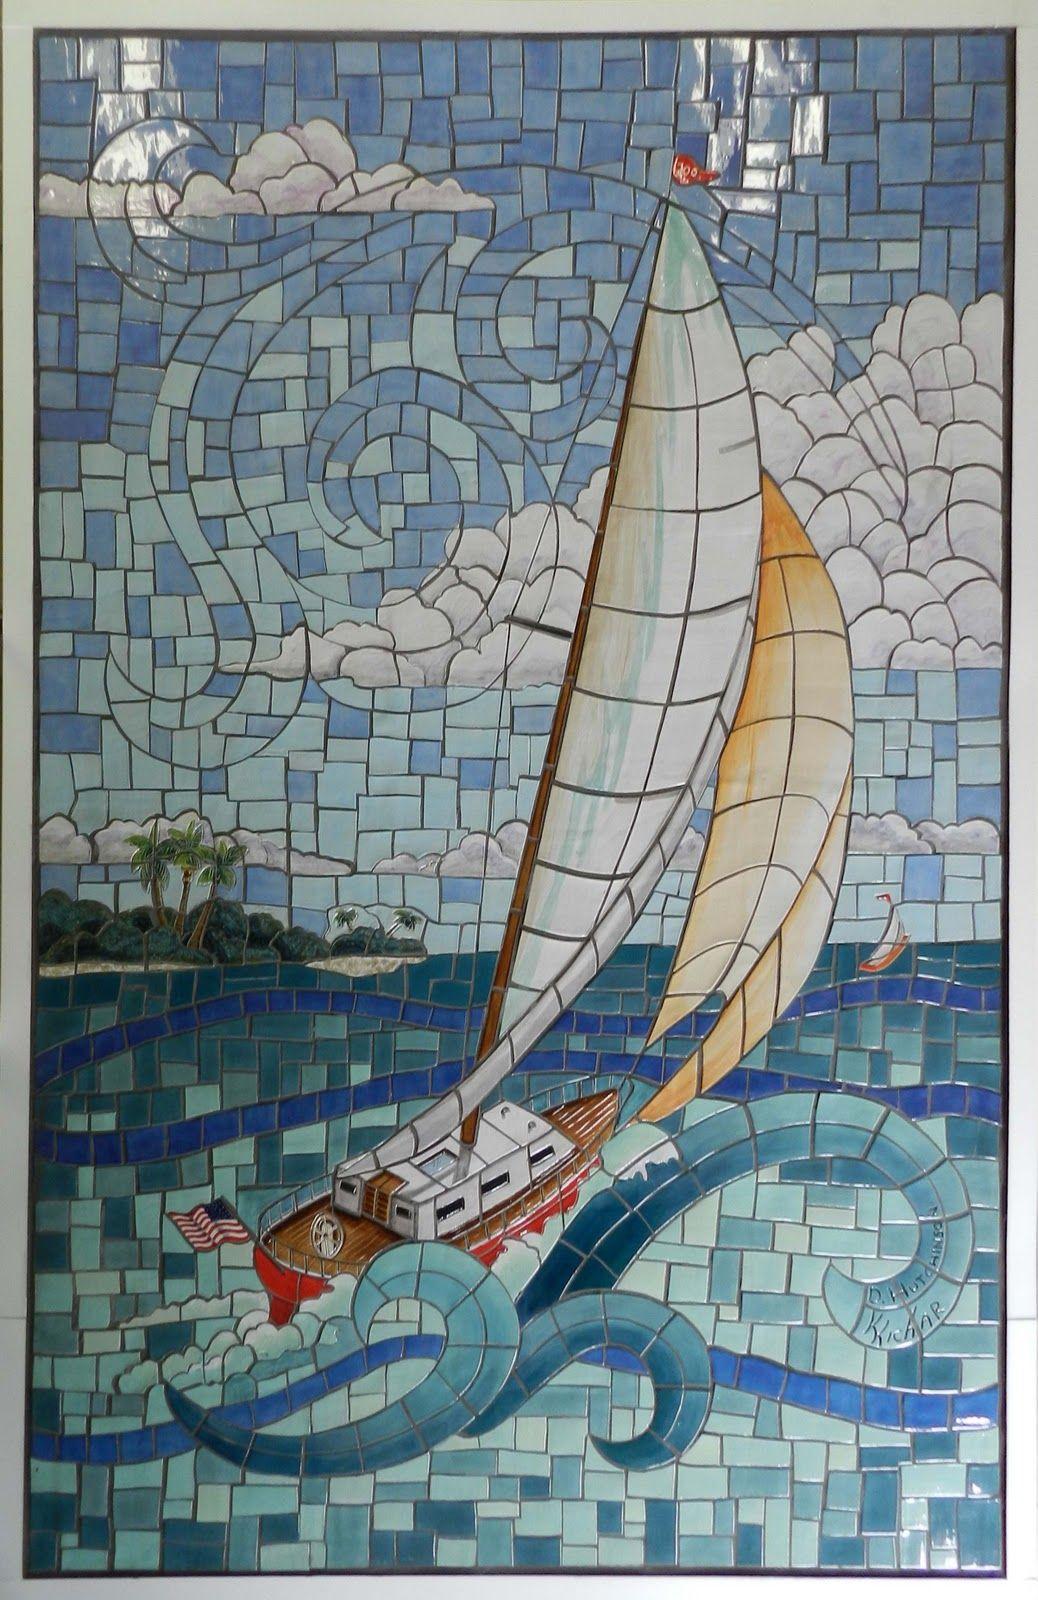 Modern Mosaic Tile Murals With Elegant Blue Sailboard For Simple Design Ideas Art